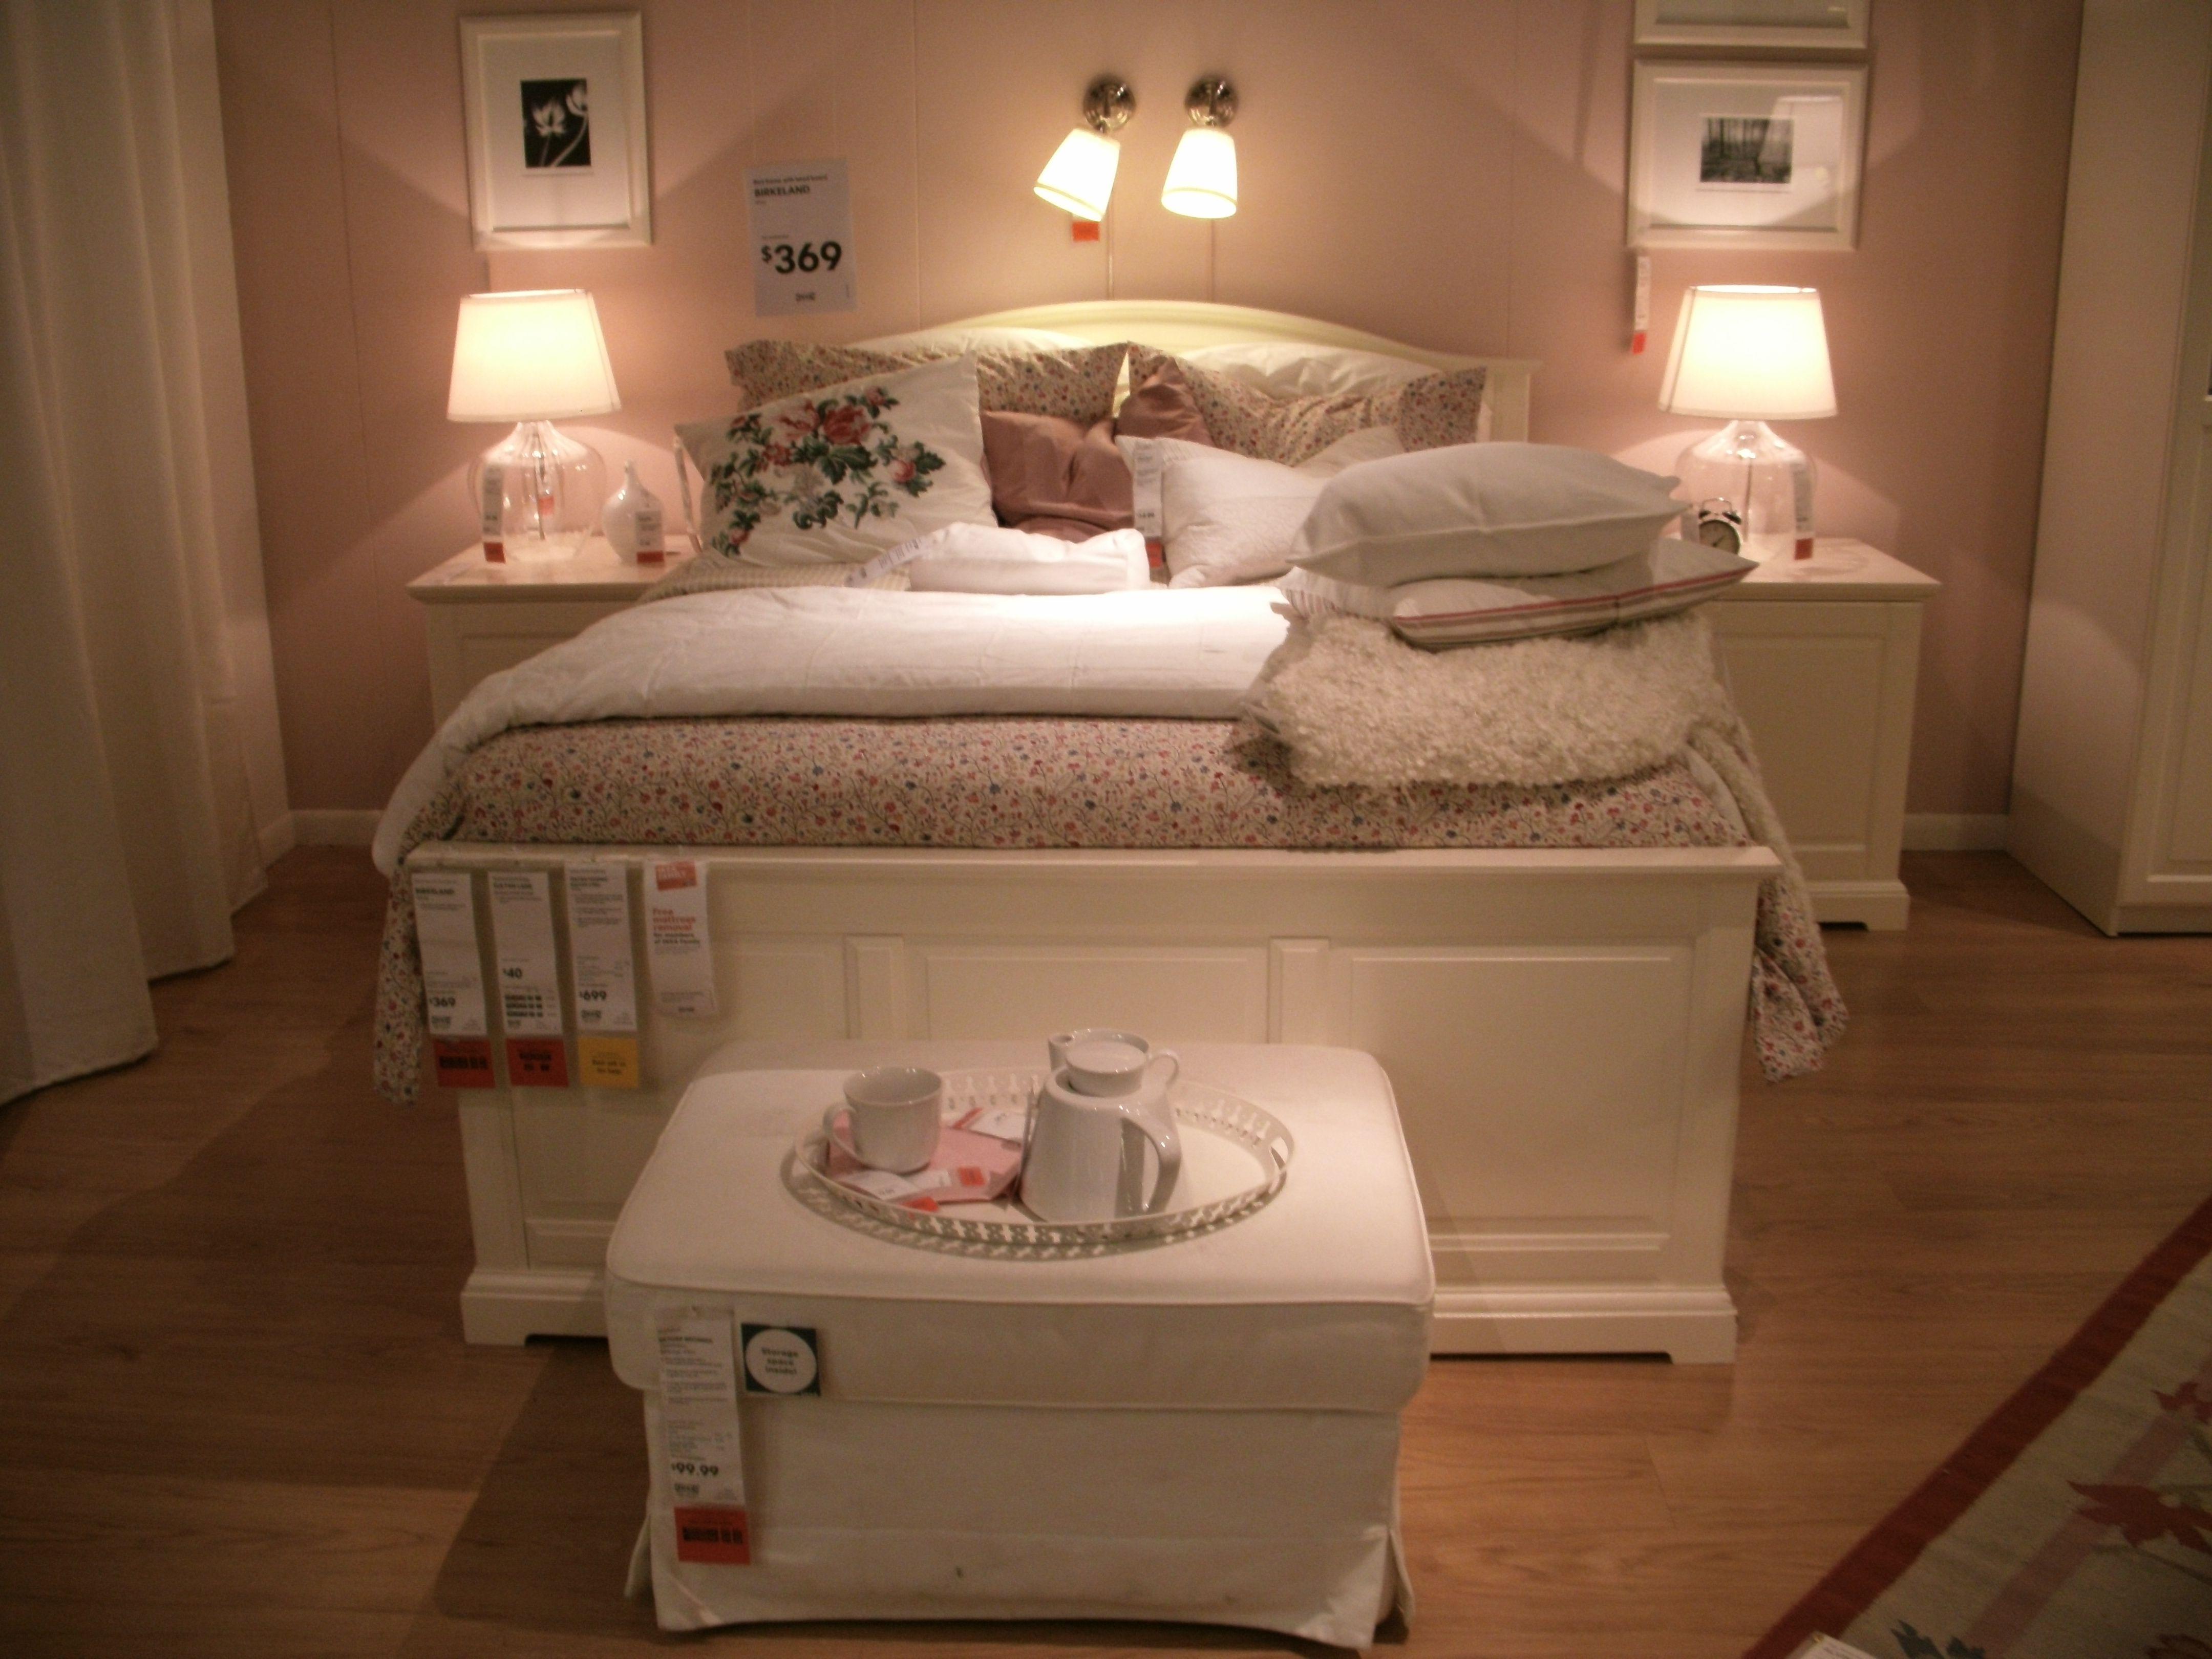 Ikea bedroom setup | For the Home | Pinterest | Schlafzimmer, Zimmer ...